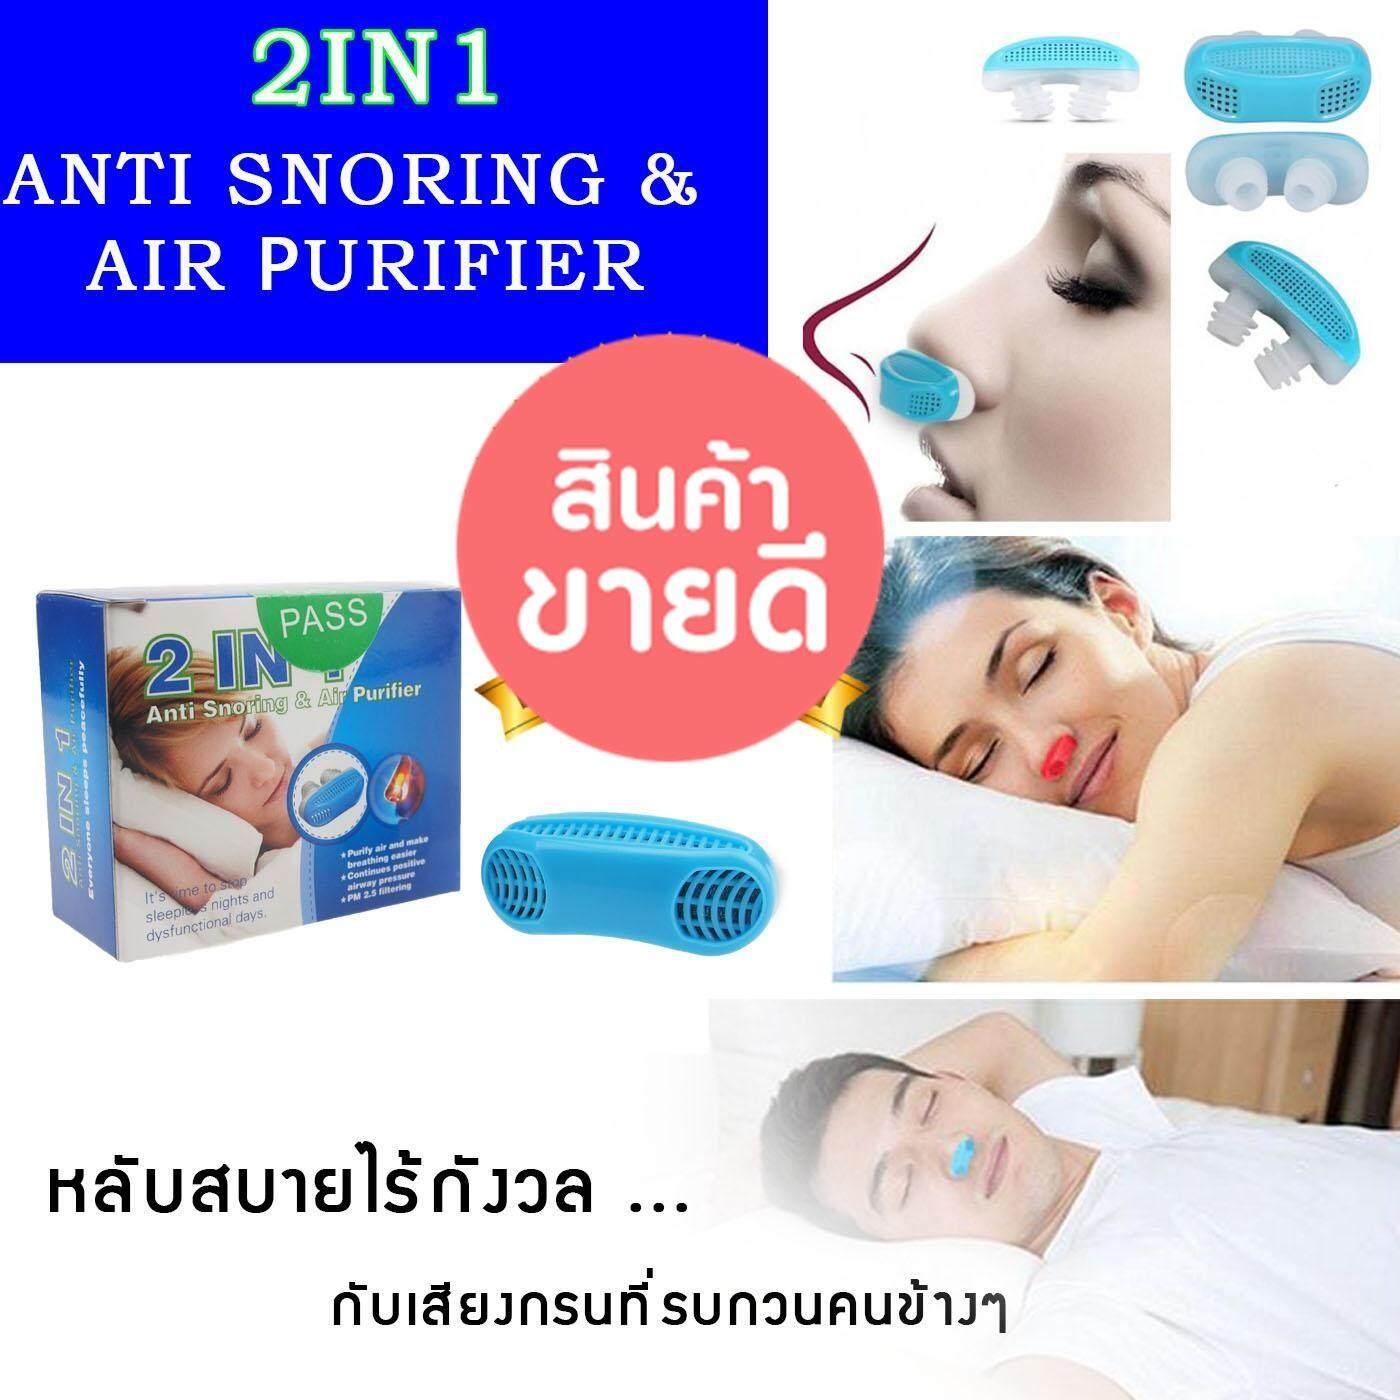 2 In 1 Anti Snoring And Air Purifier อุปกรณ์สวมจมูก 2 อิน 1 แก้นอนกรนและกรองอากาศ ใช้แทน หน้ากากอนามัย กรองฝุ่น Pm 2.5 ได้ ขนาดเล็ก พกพาสะดวก By Beebeamshop.